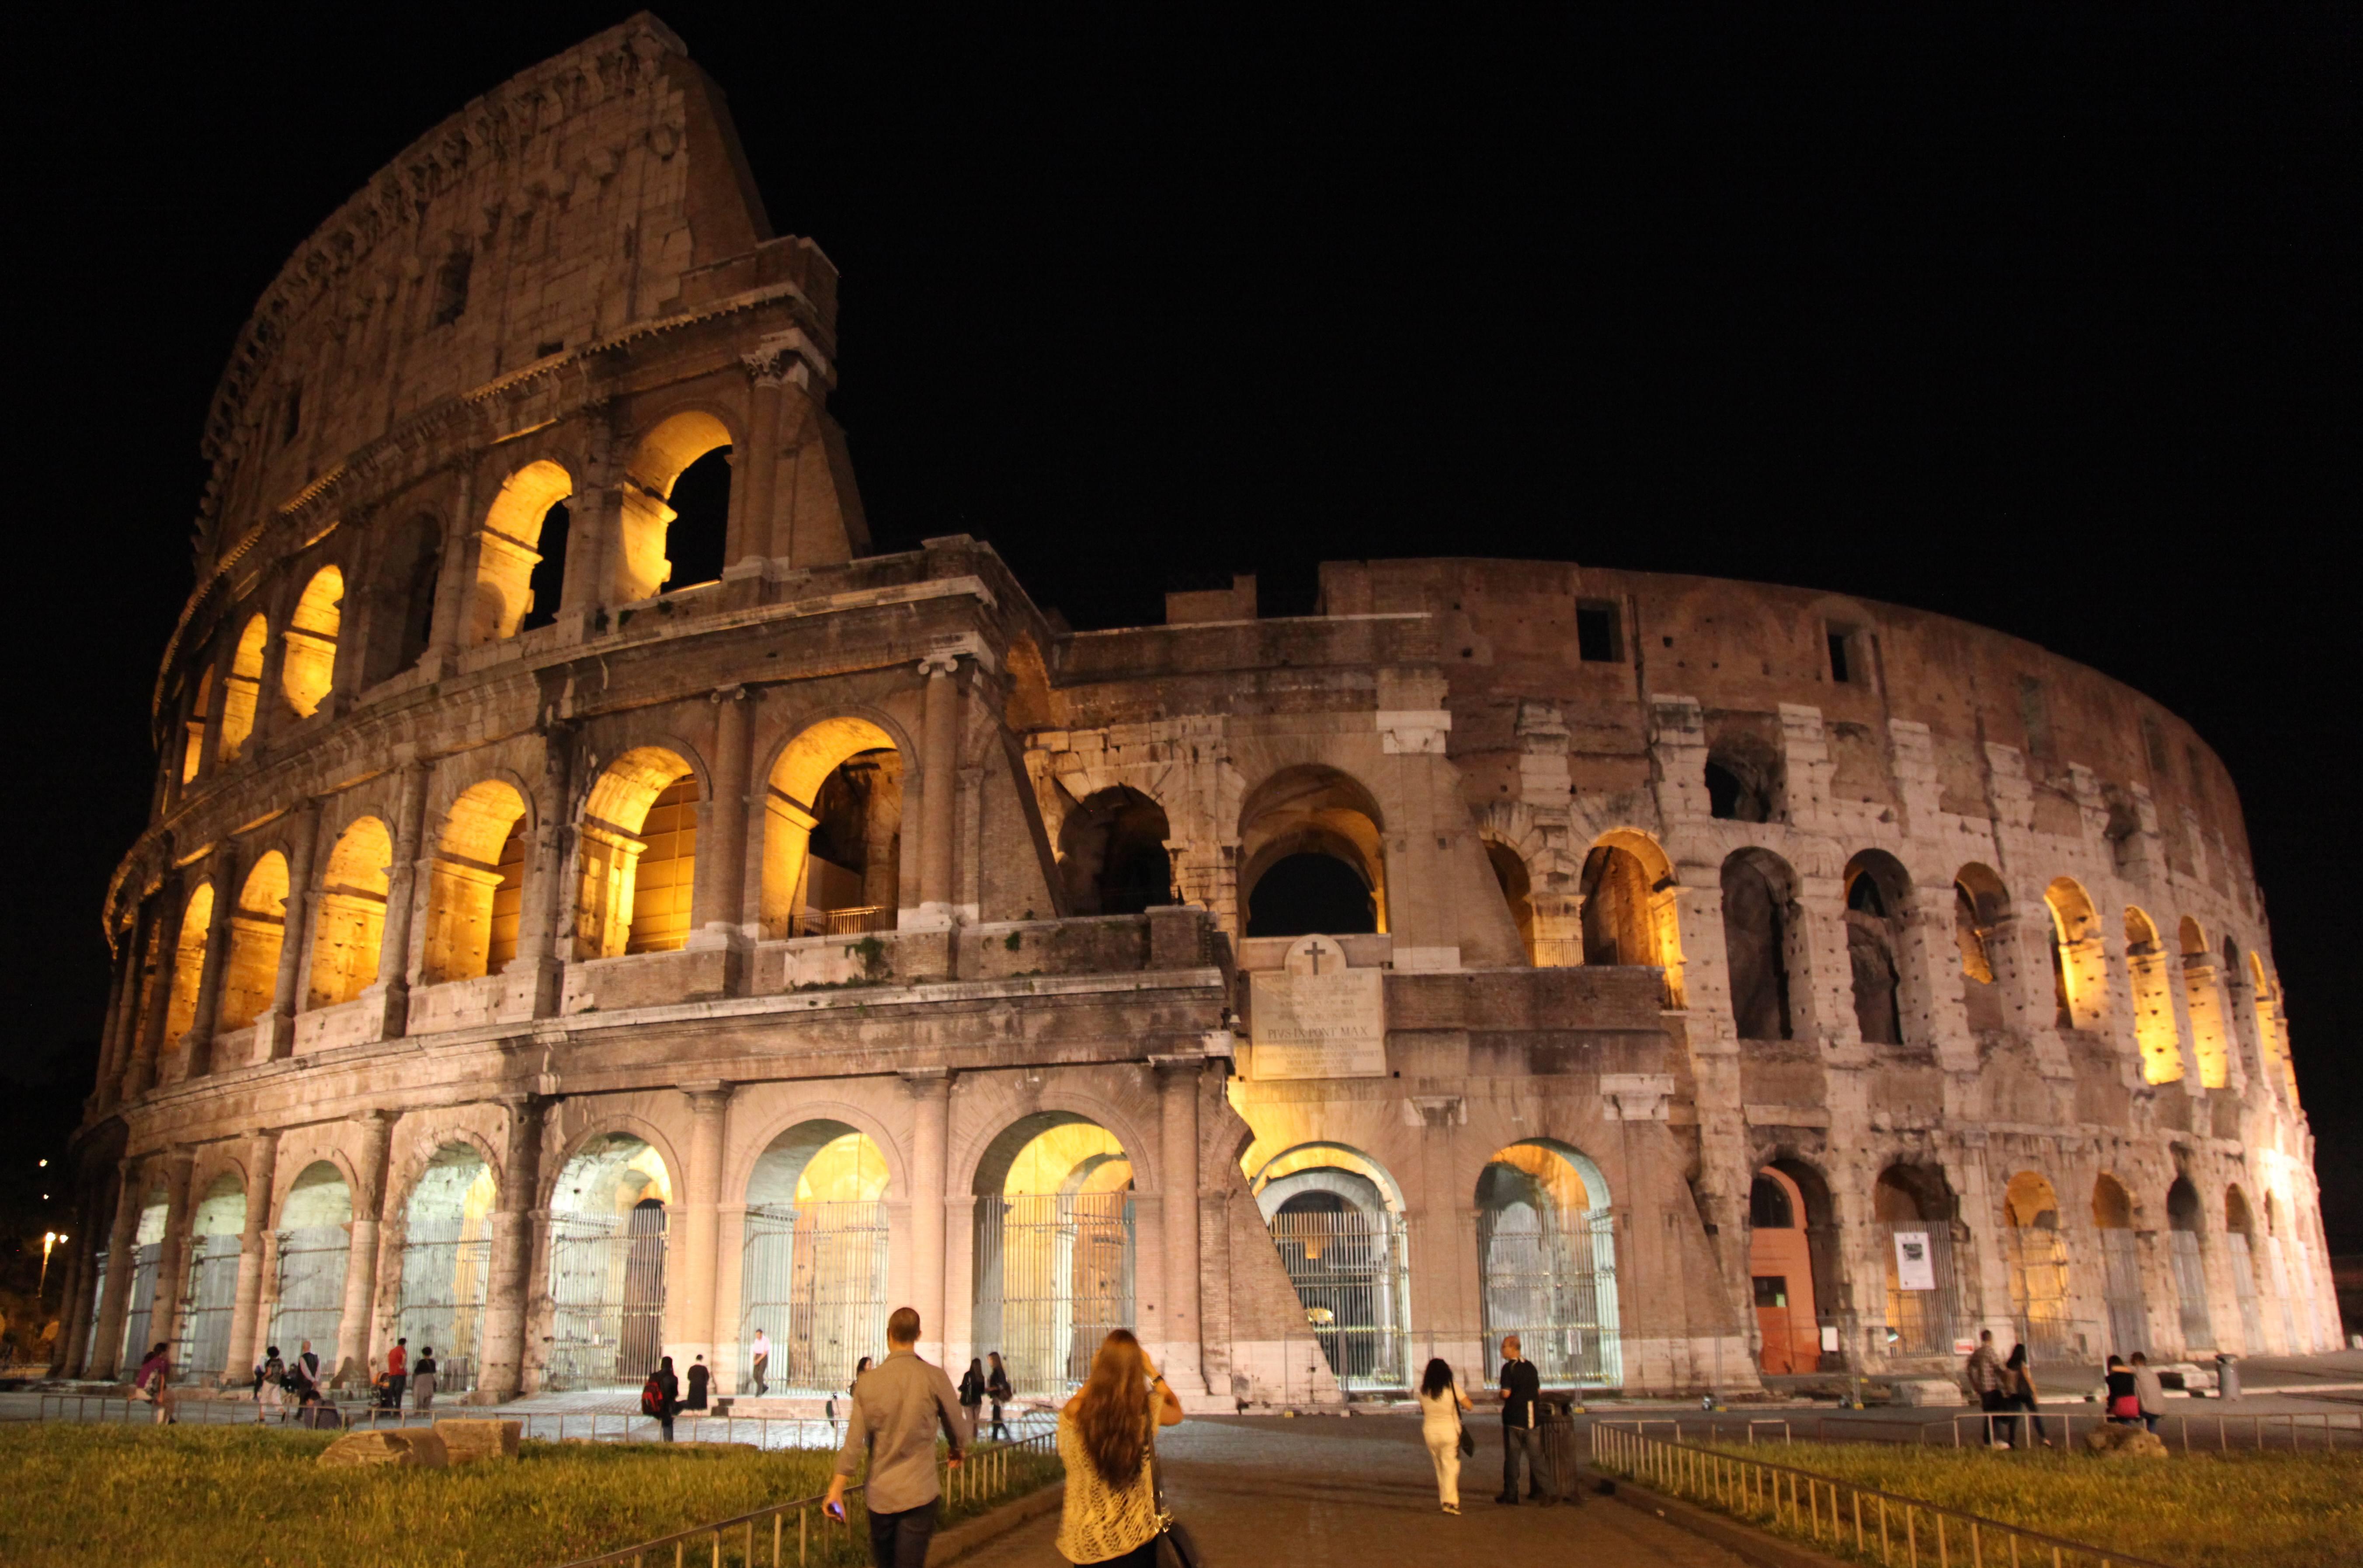 Colosseum Night Tour & Ticket